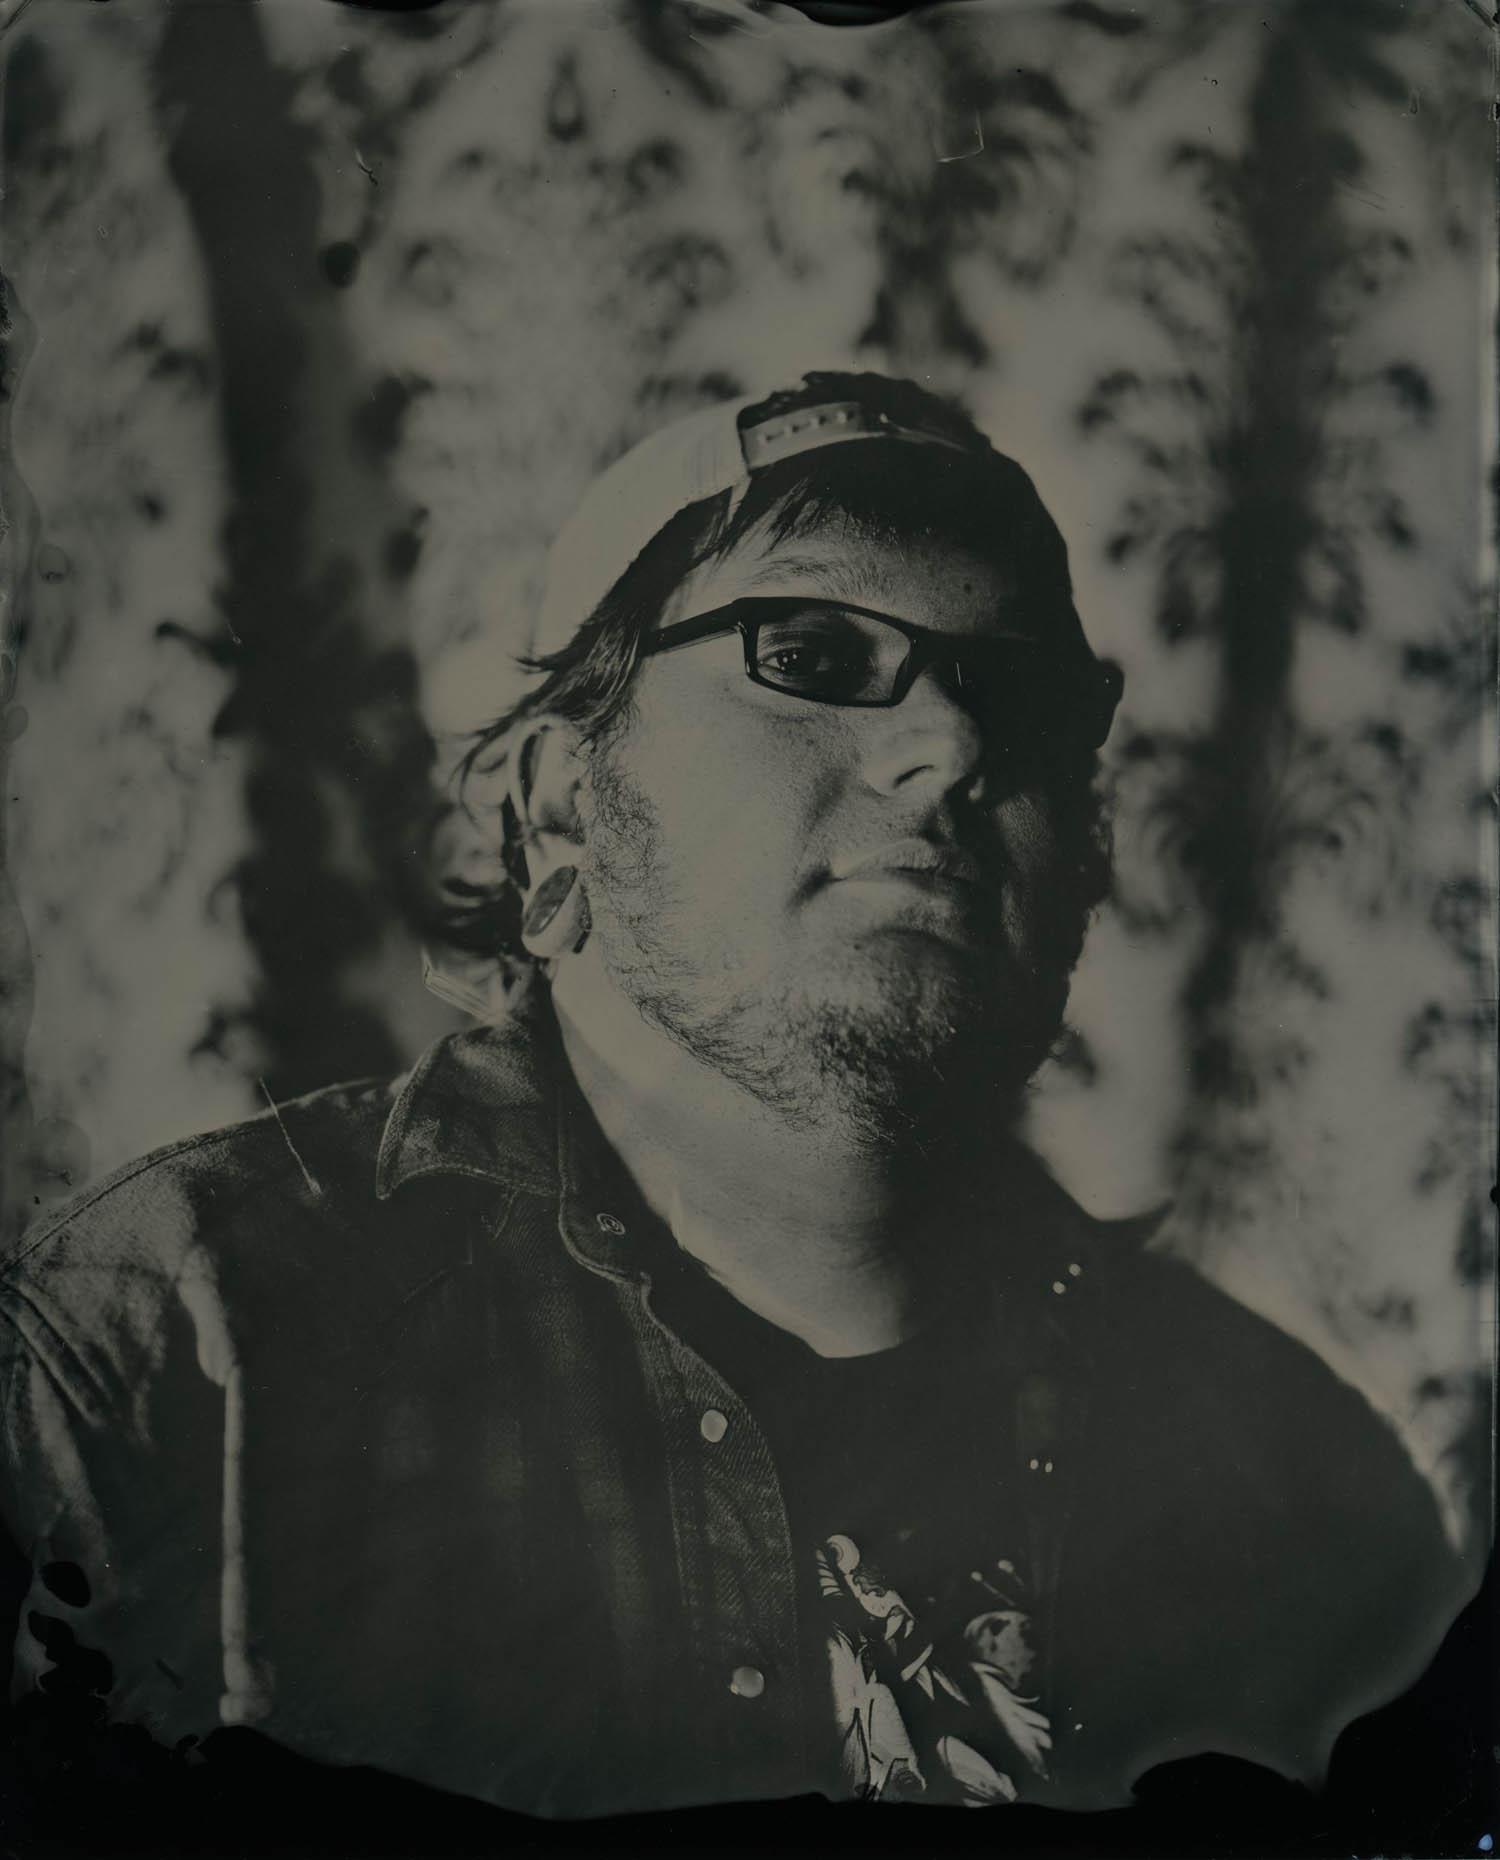 John, 2018 - Tintype